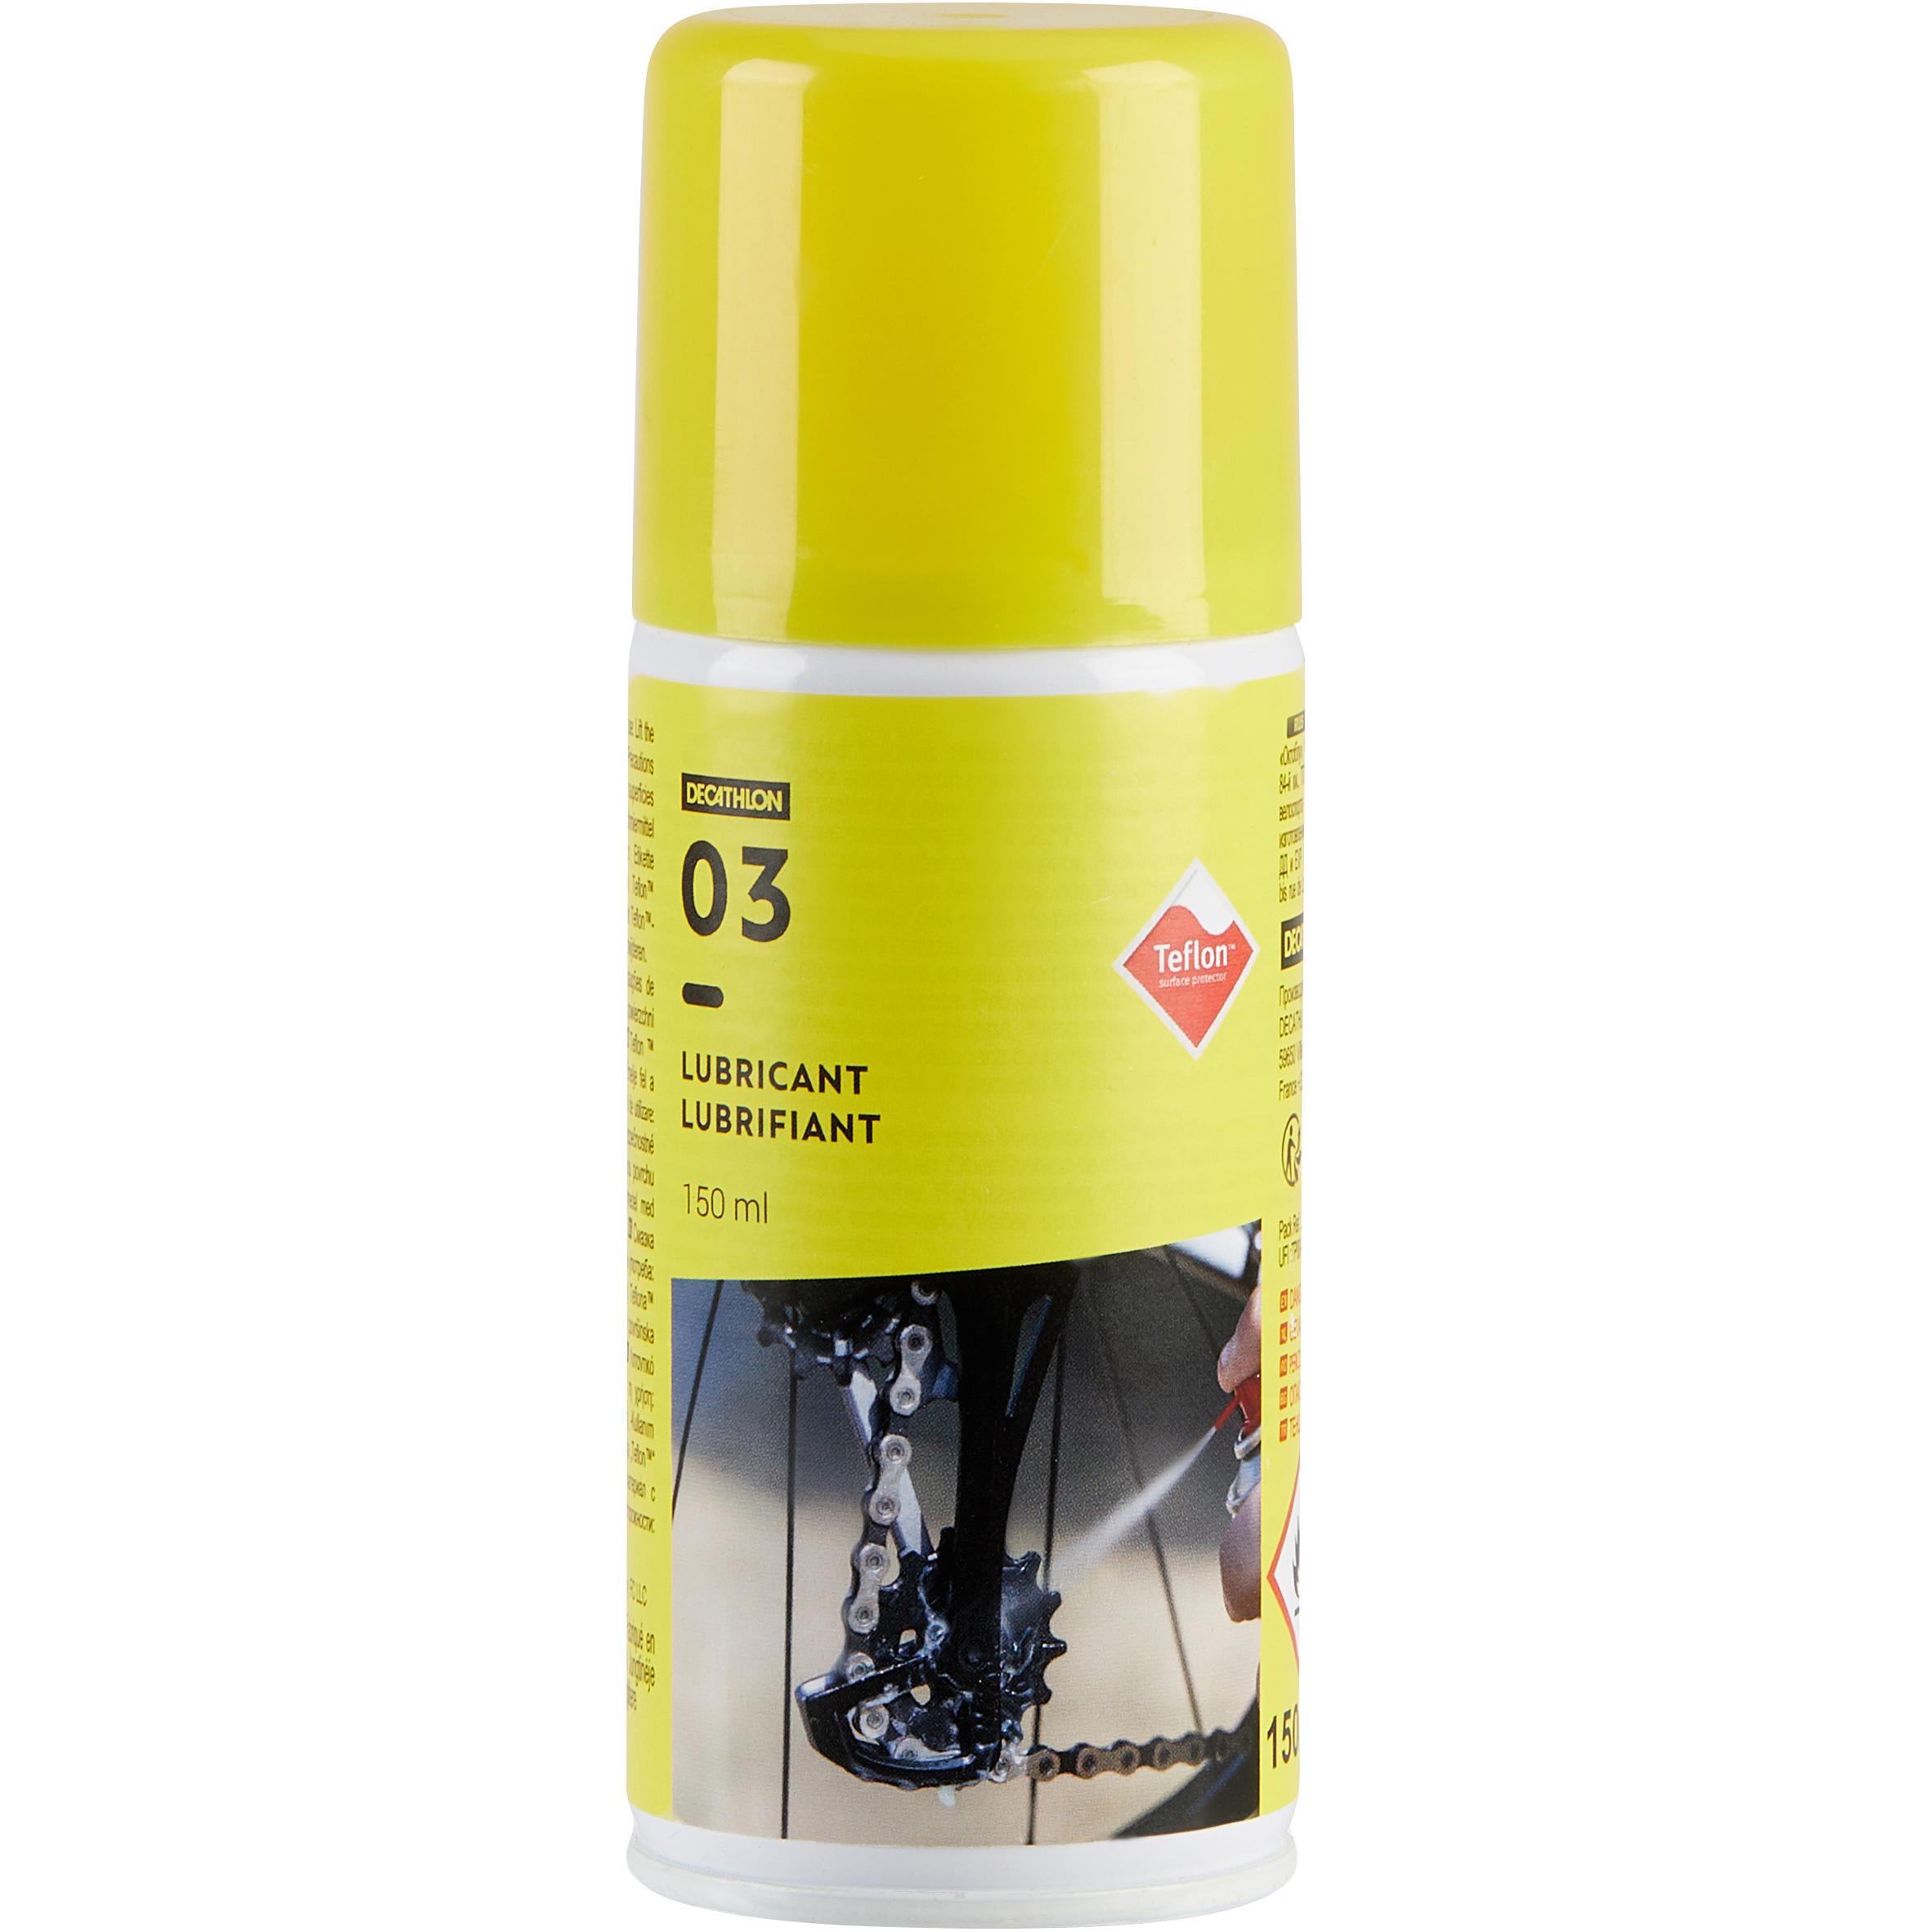 B'twin Spray Teflon™ fietsolie kopen